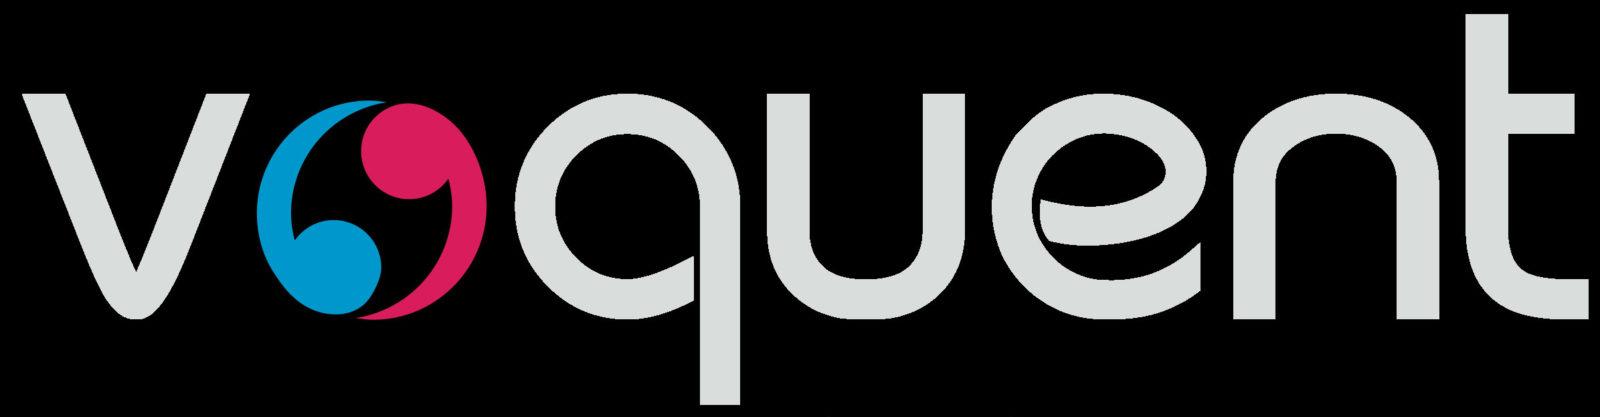 Vquent logo black background